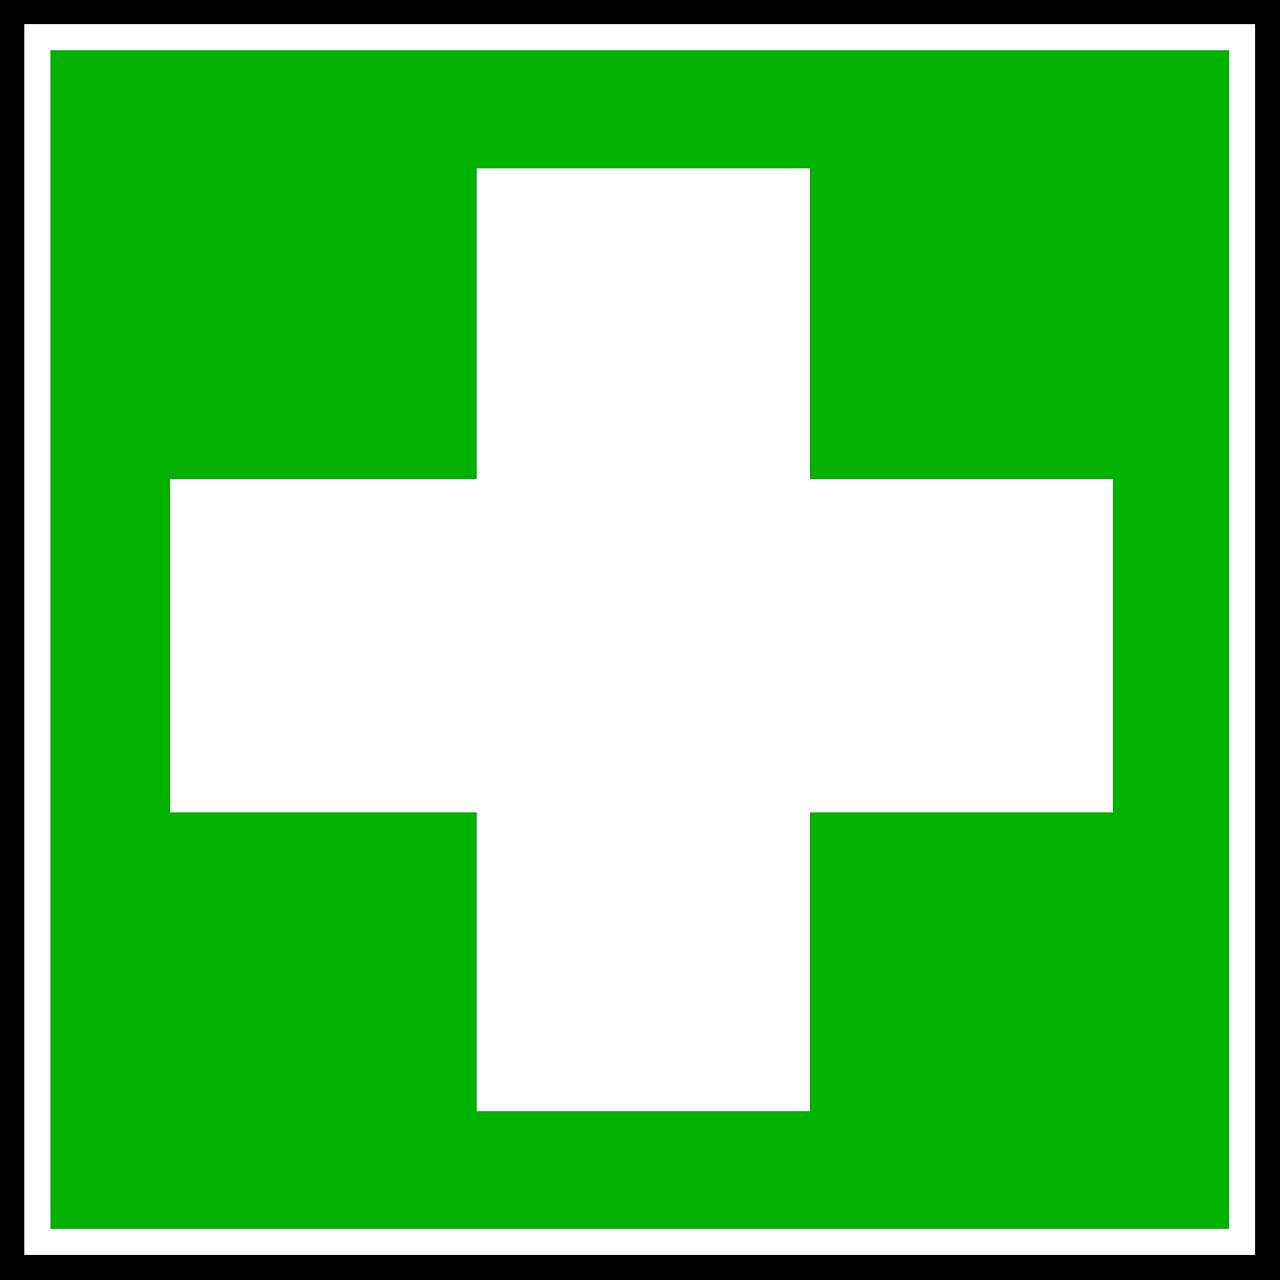 Farmacia Cristina Mora